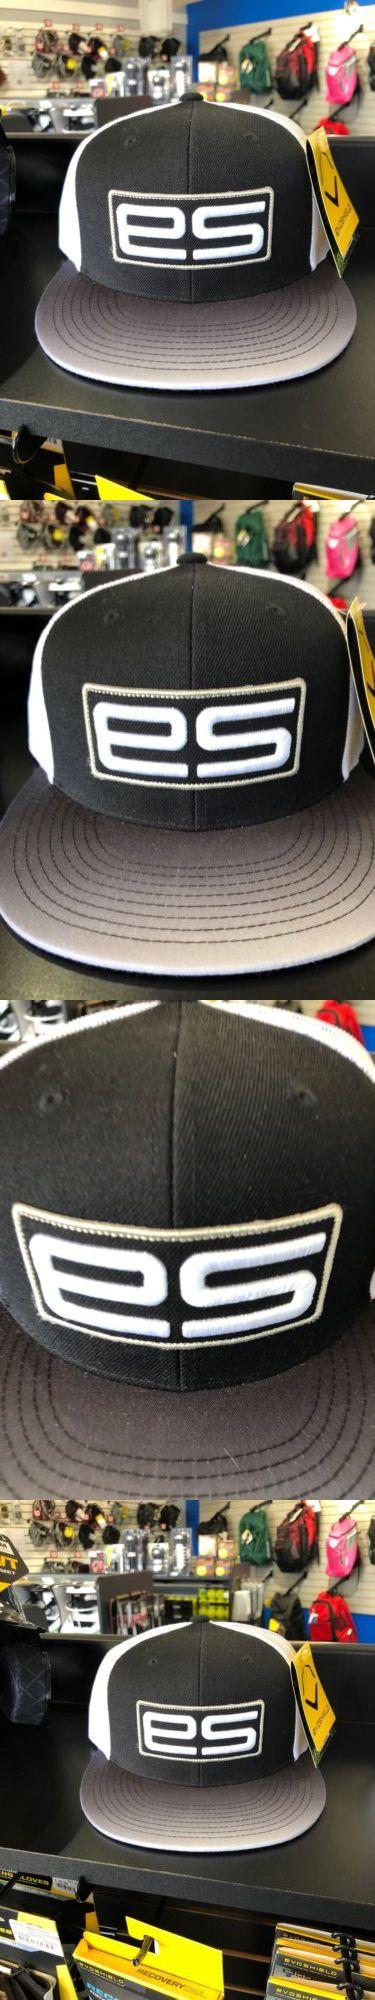 55c3c055a03 Hats and Headwear 159057  Evoshield Es Logo Flatbill Snapback Hat -  Evoshield Black One Size